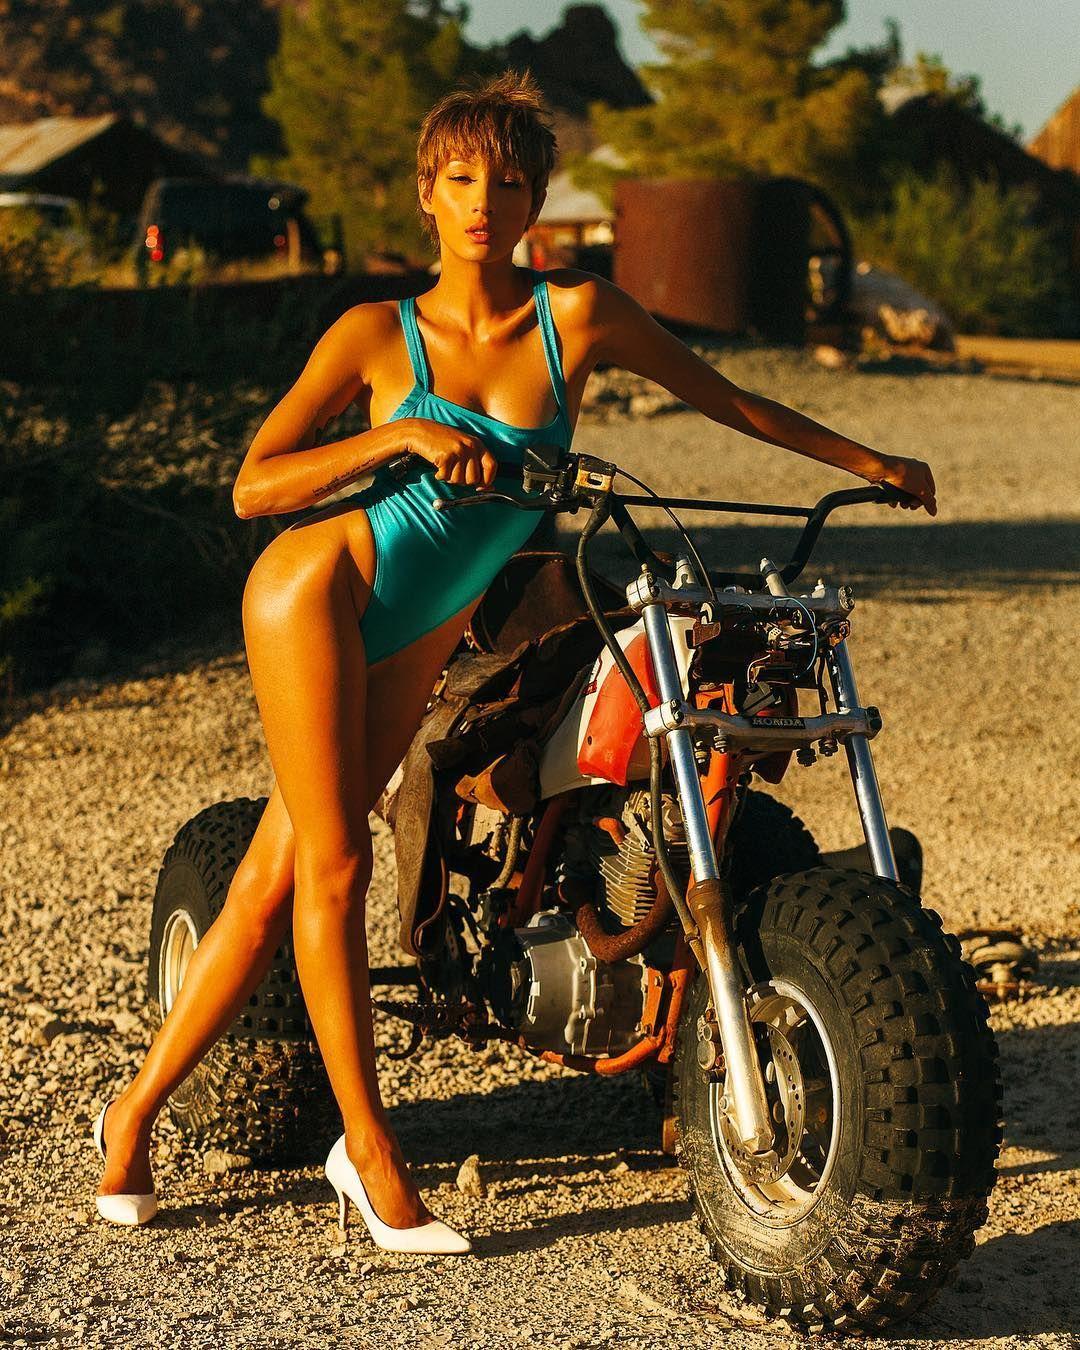 Taylor momsen4,Jacqueline McKenzie etcRomper Stomper  Hot fotos Lauren Goodger Bikini,Sasha fierce boobs